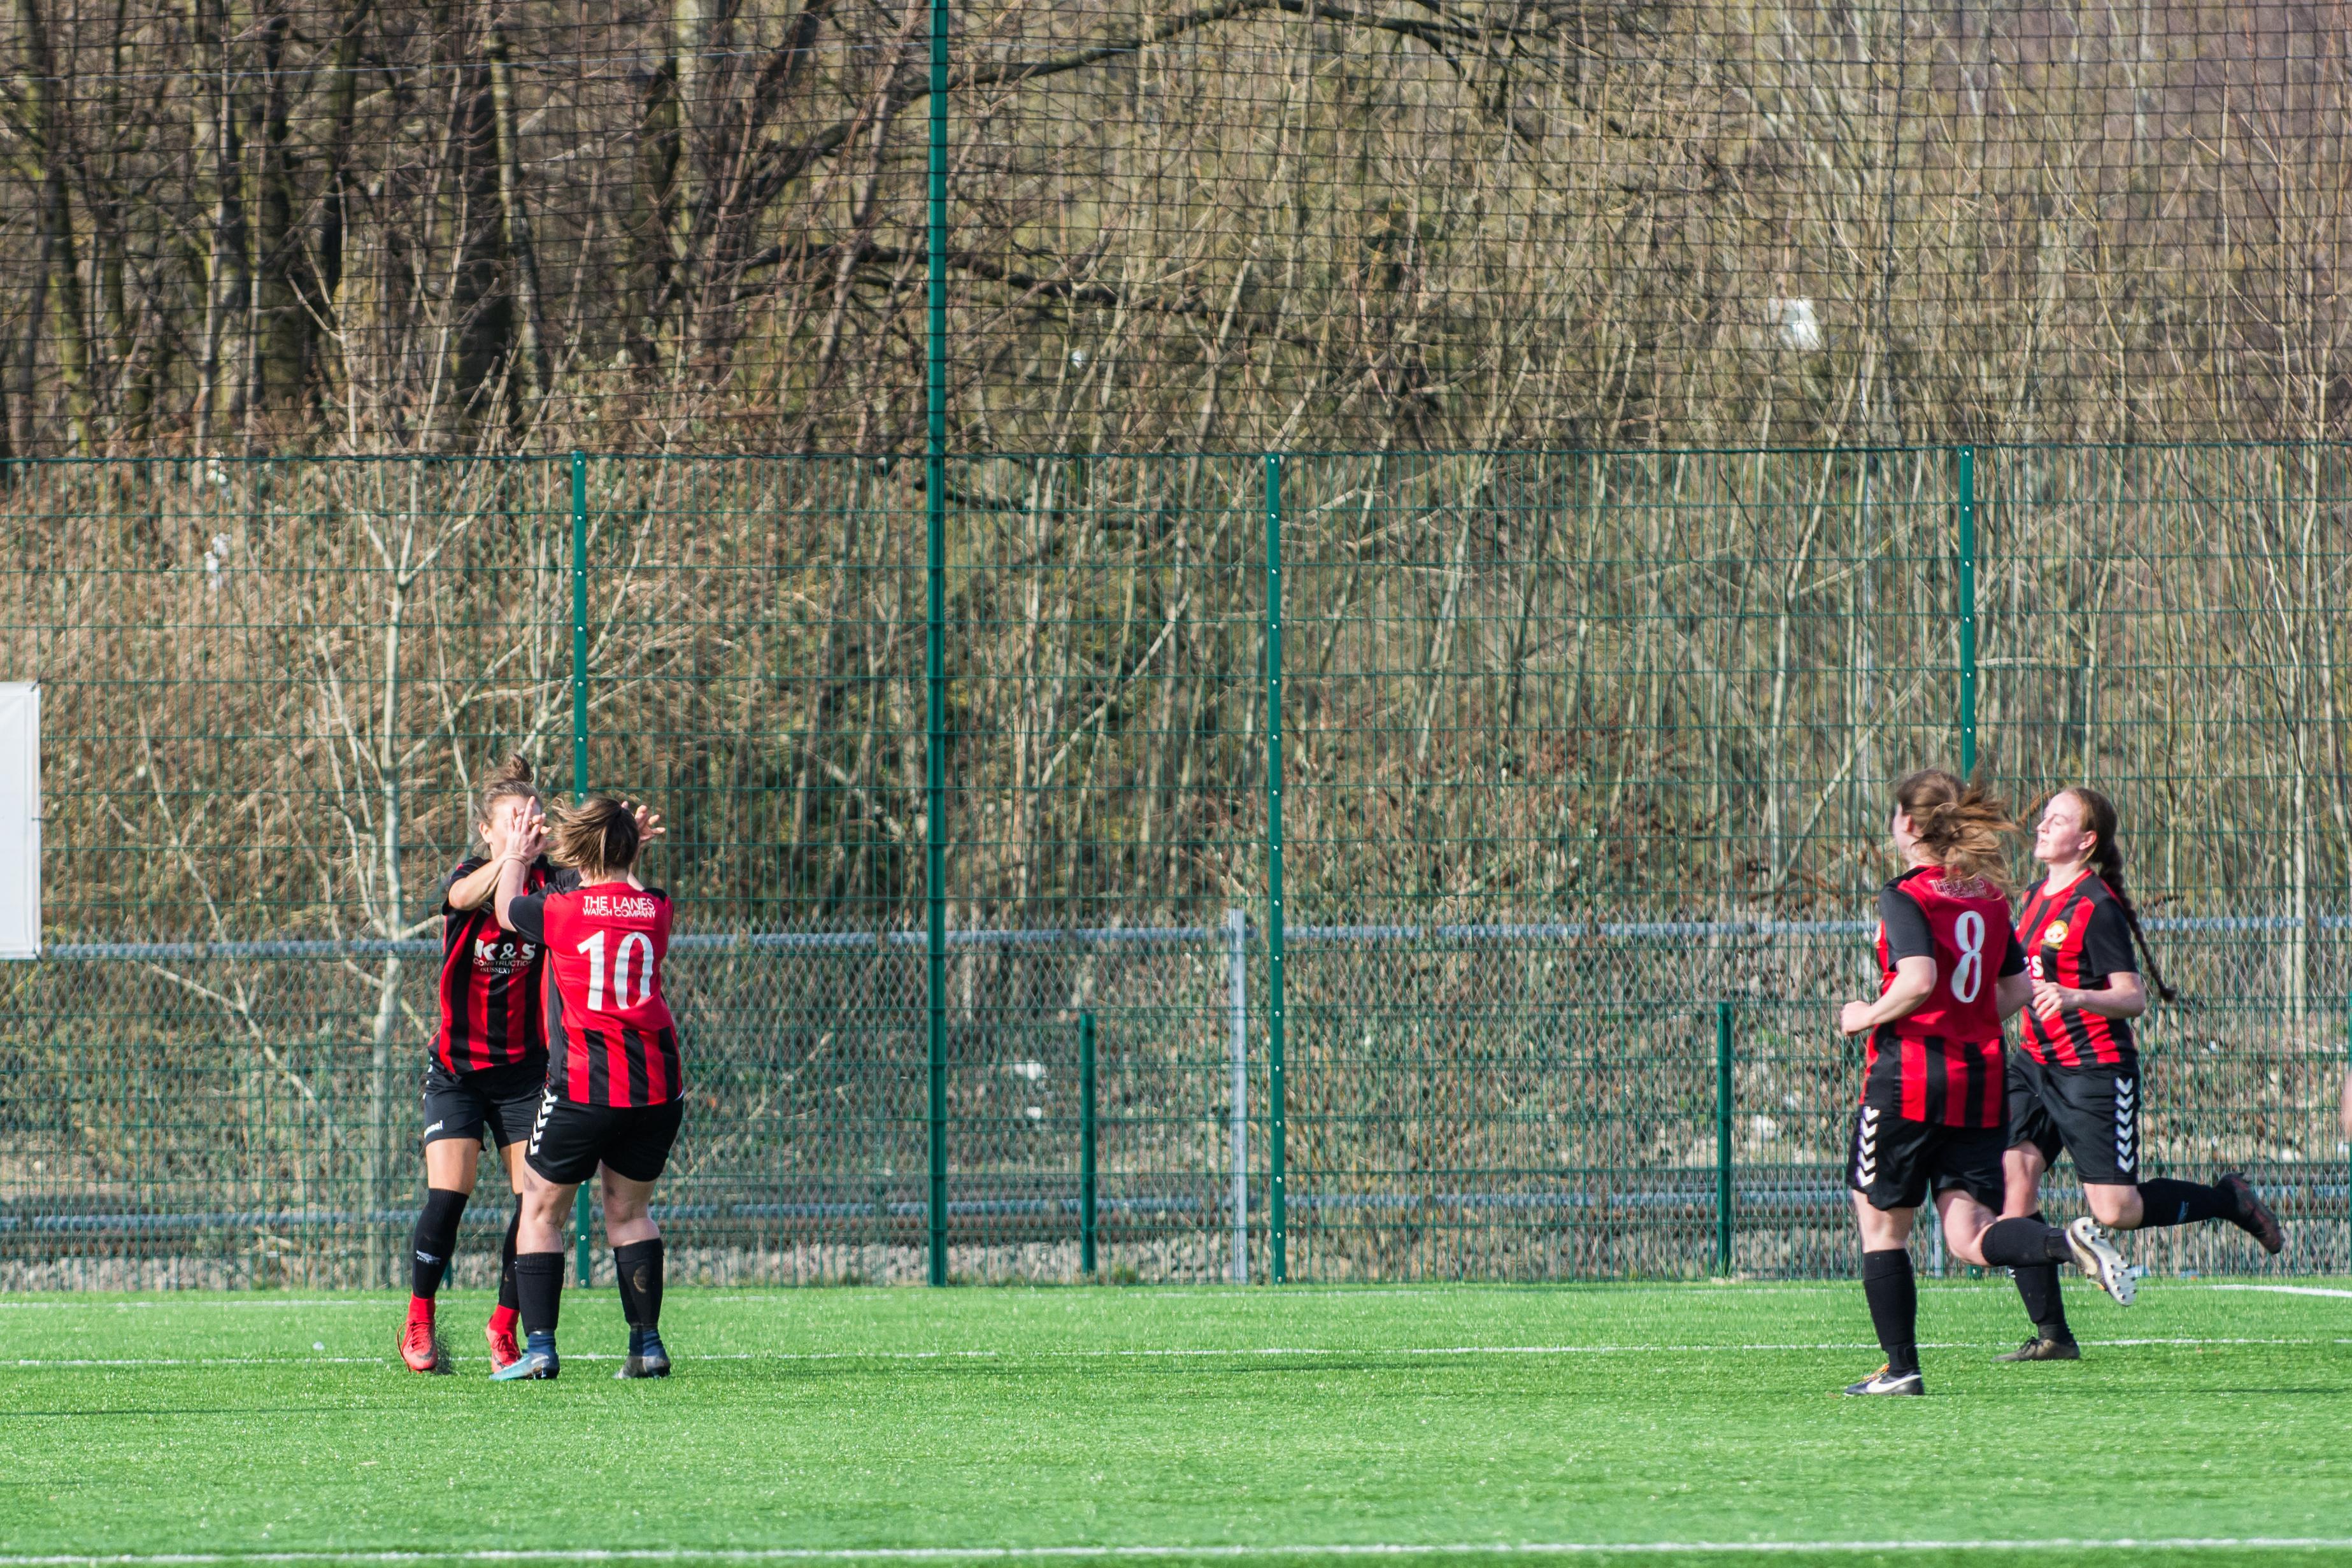 DAVID_JEFFERY Saltdean Utd Ladies FC vs Worthing Utd Ladies FC 11.03.18 29